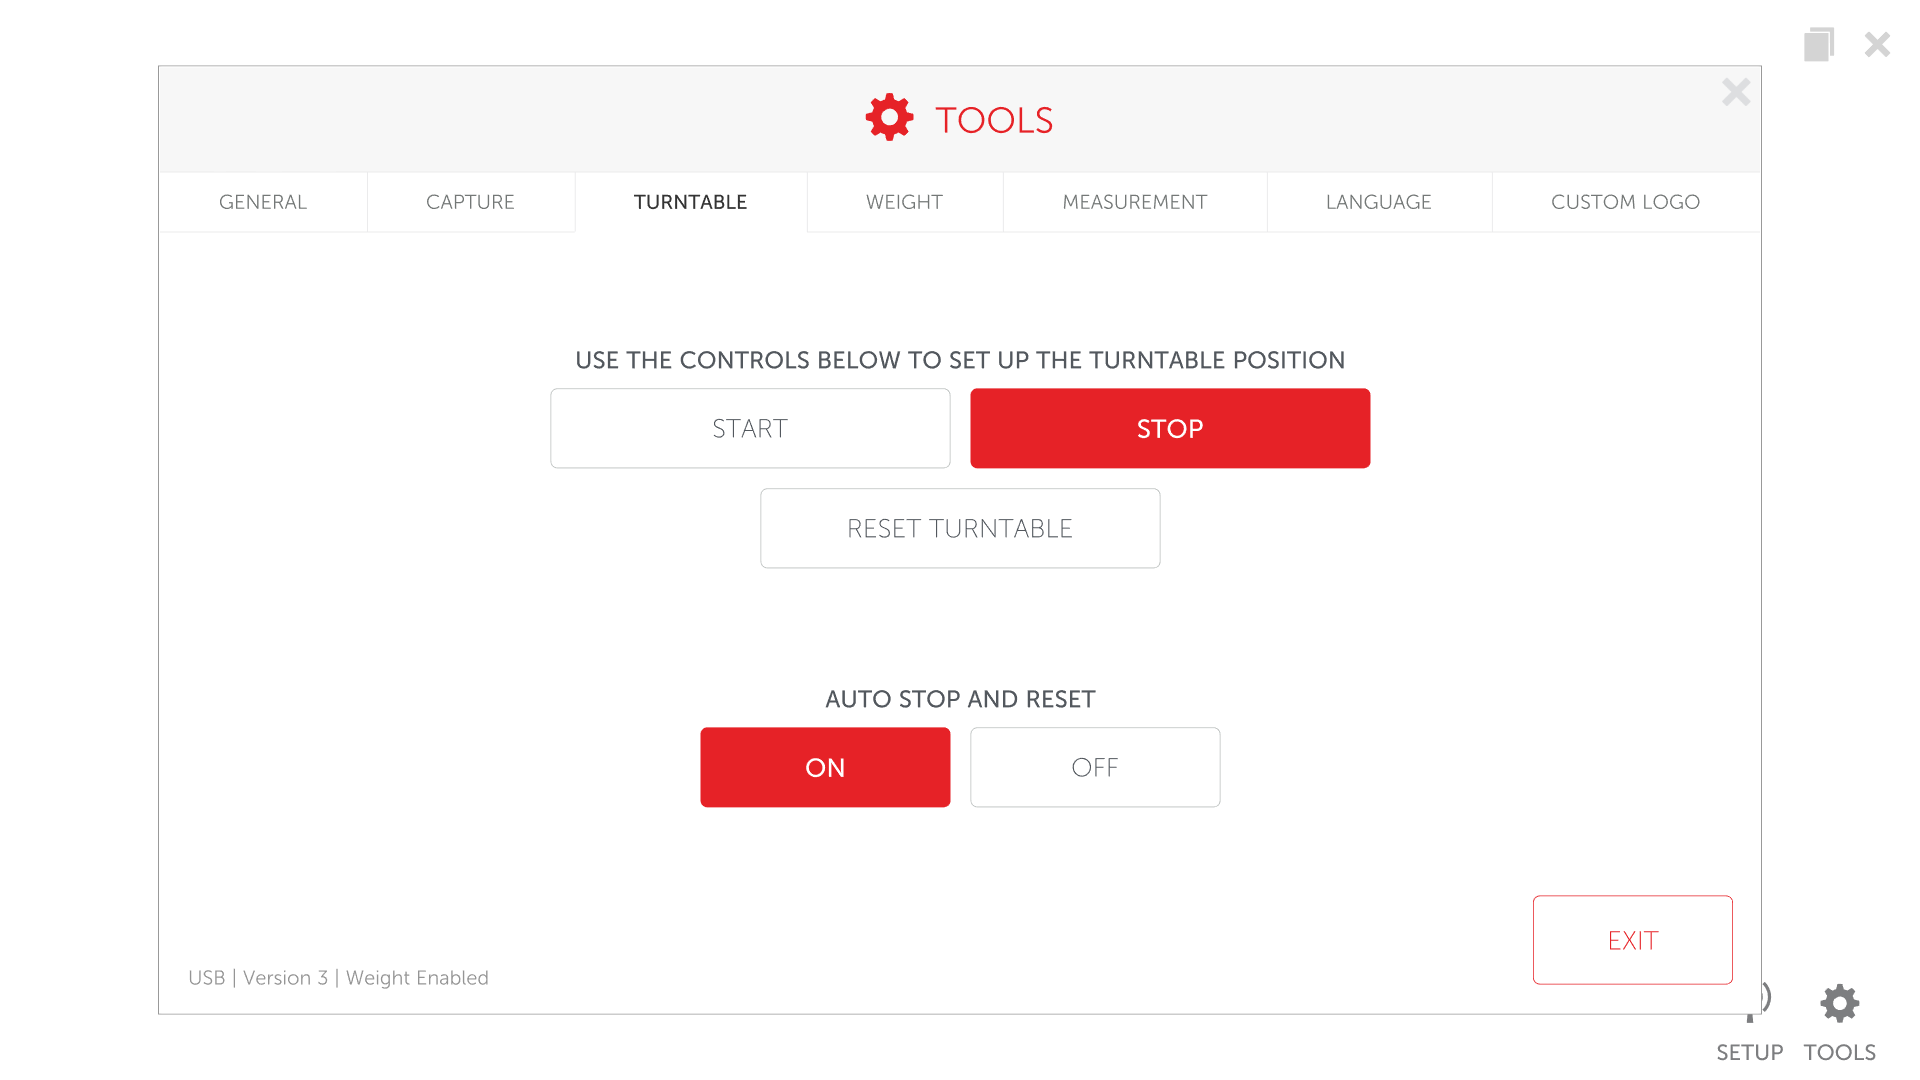 Turntable menu screen